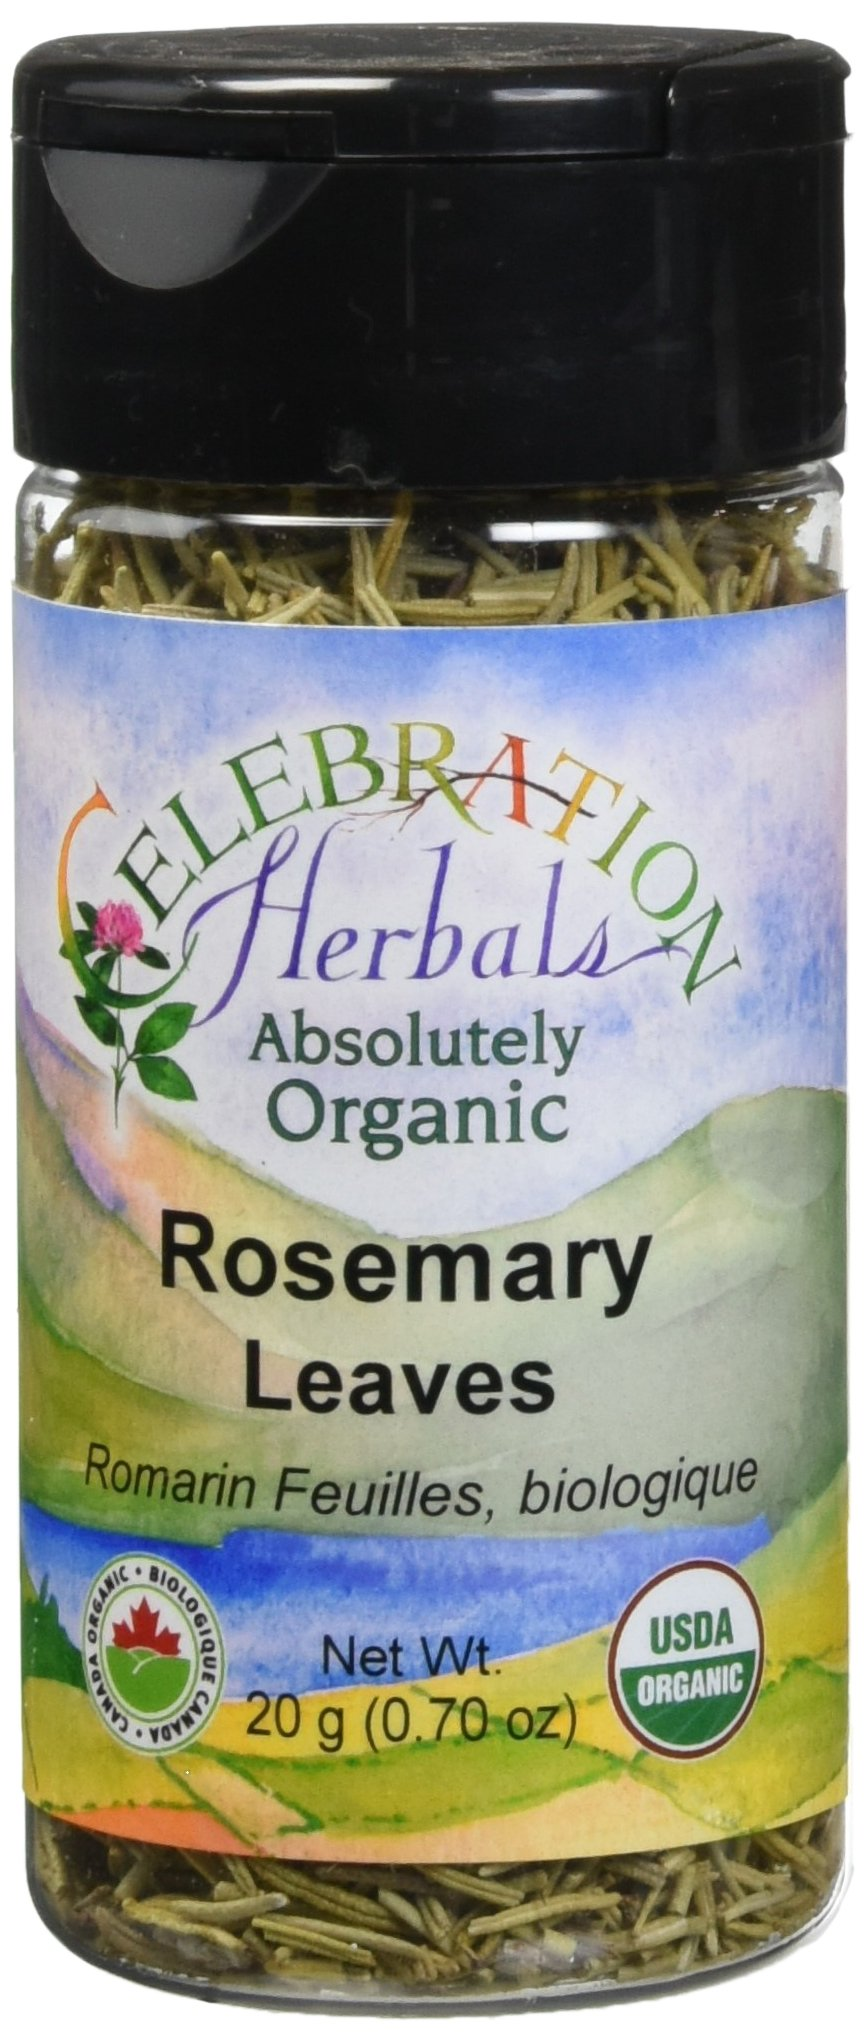 CELEBRATION HERBALS Rosemary Leaf Whole Organic 21 g, 0.02 Pound